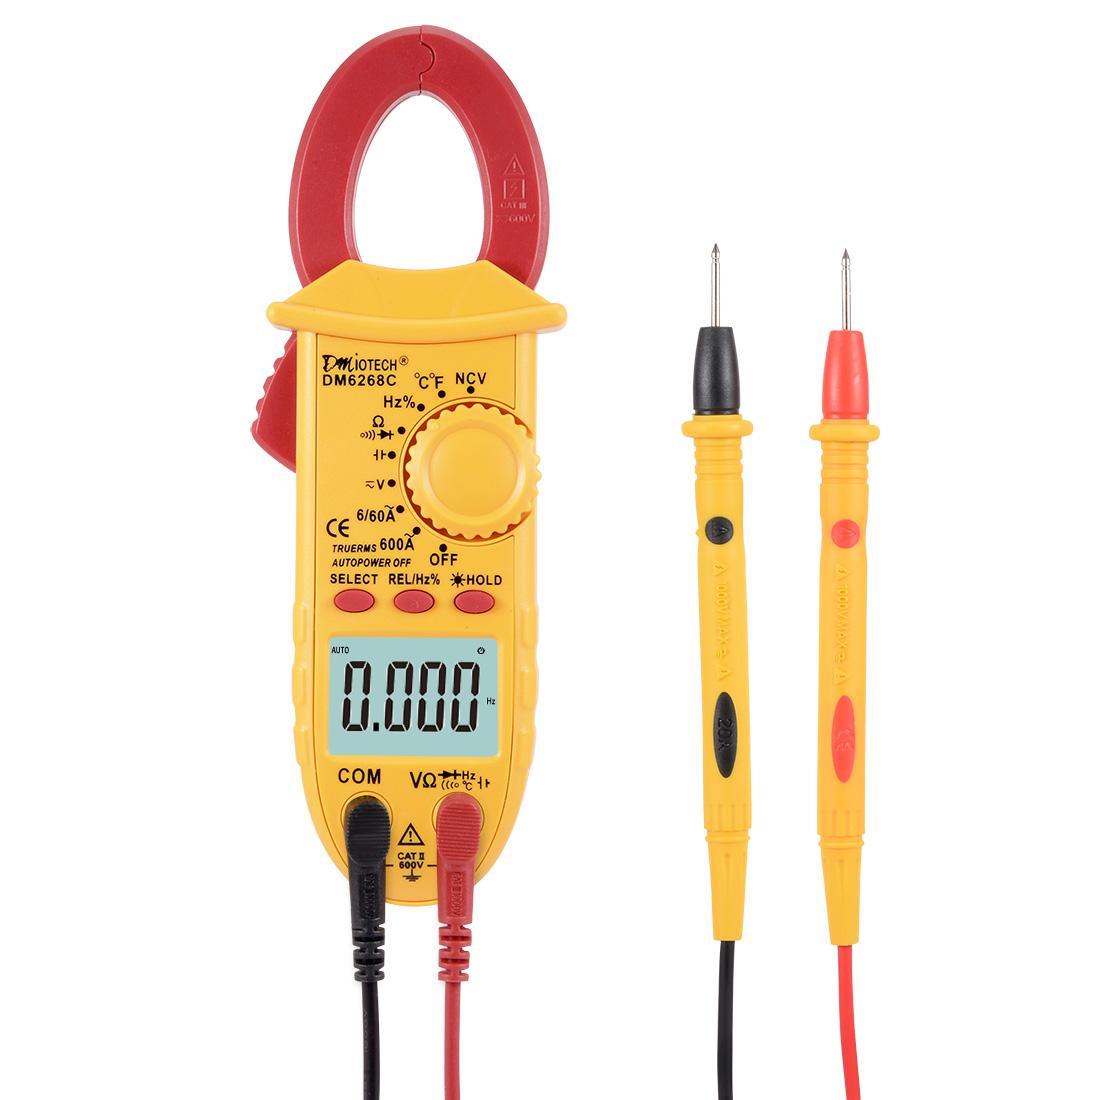 DM6268C Mini Digital Multimeter Ammeter Voltage ACV DCV Ohm Clamp Meter Tester Handheld